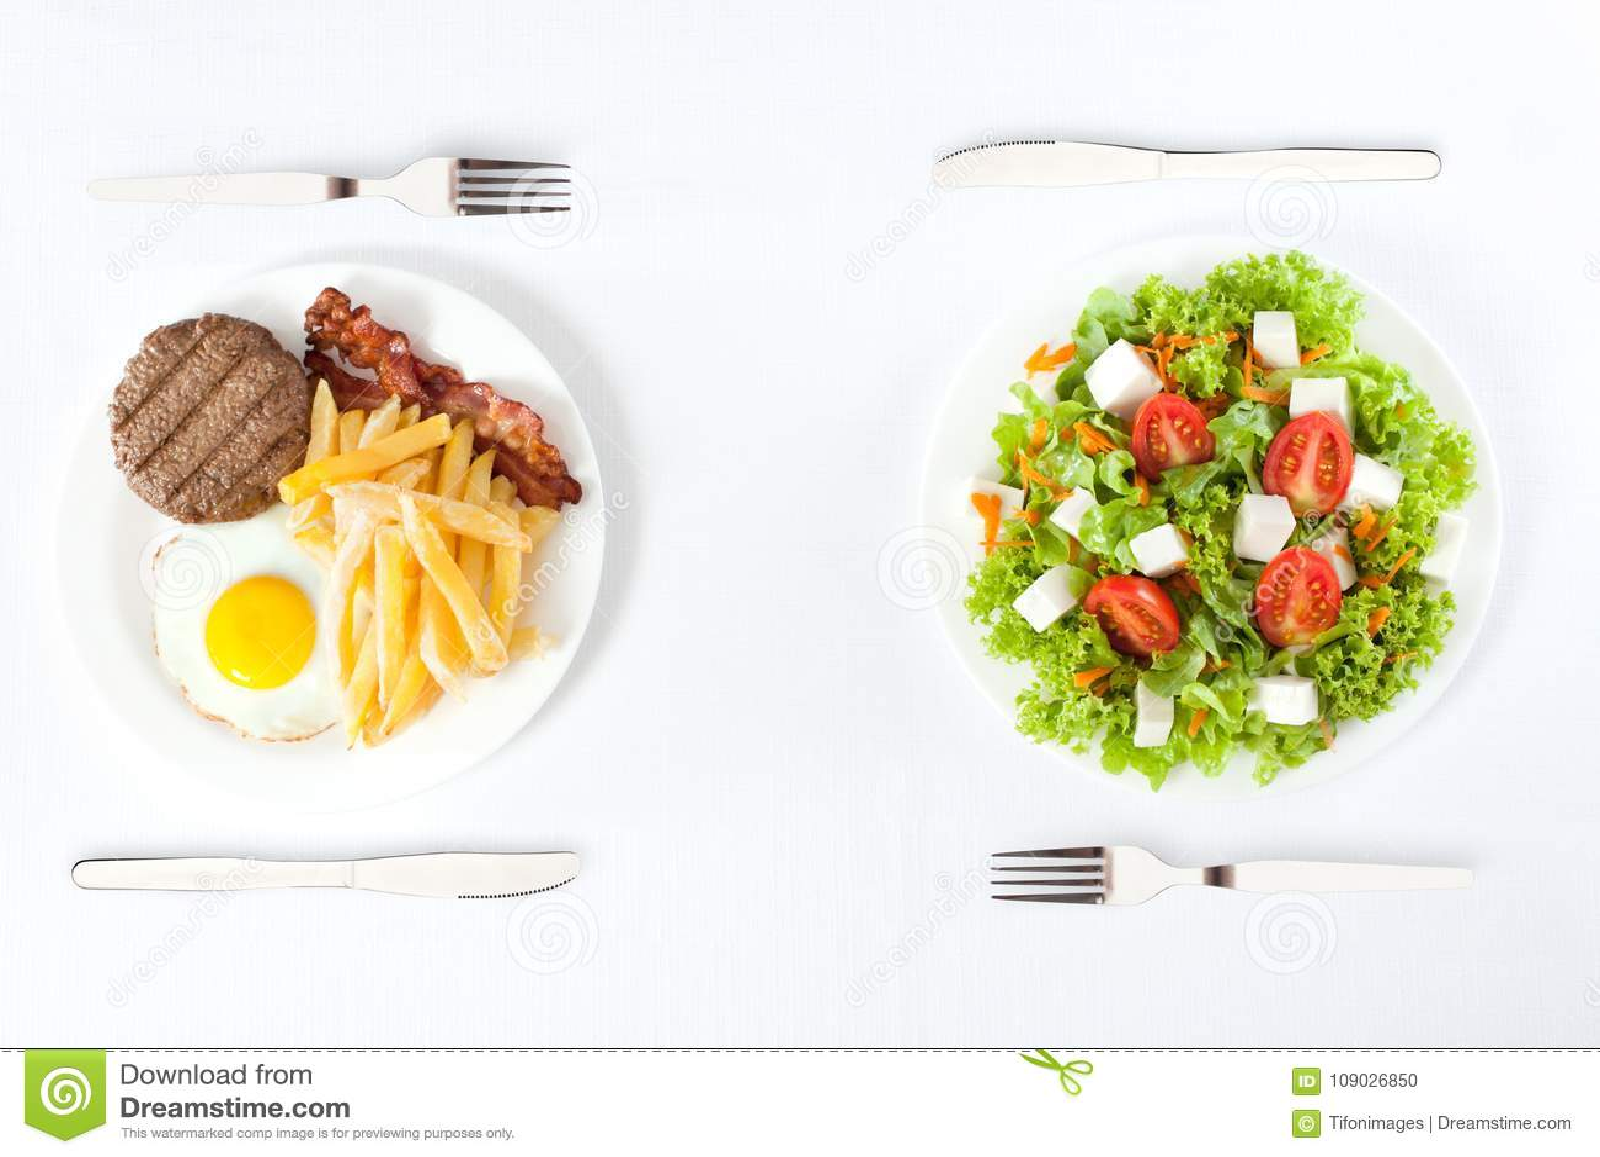 Saudável contra a comida lixo